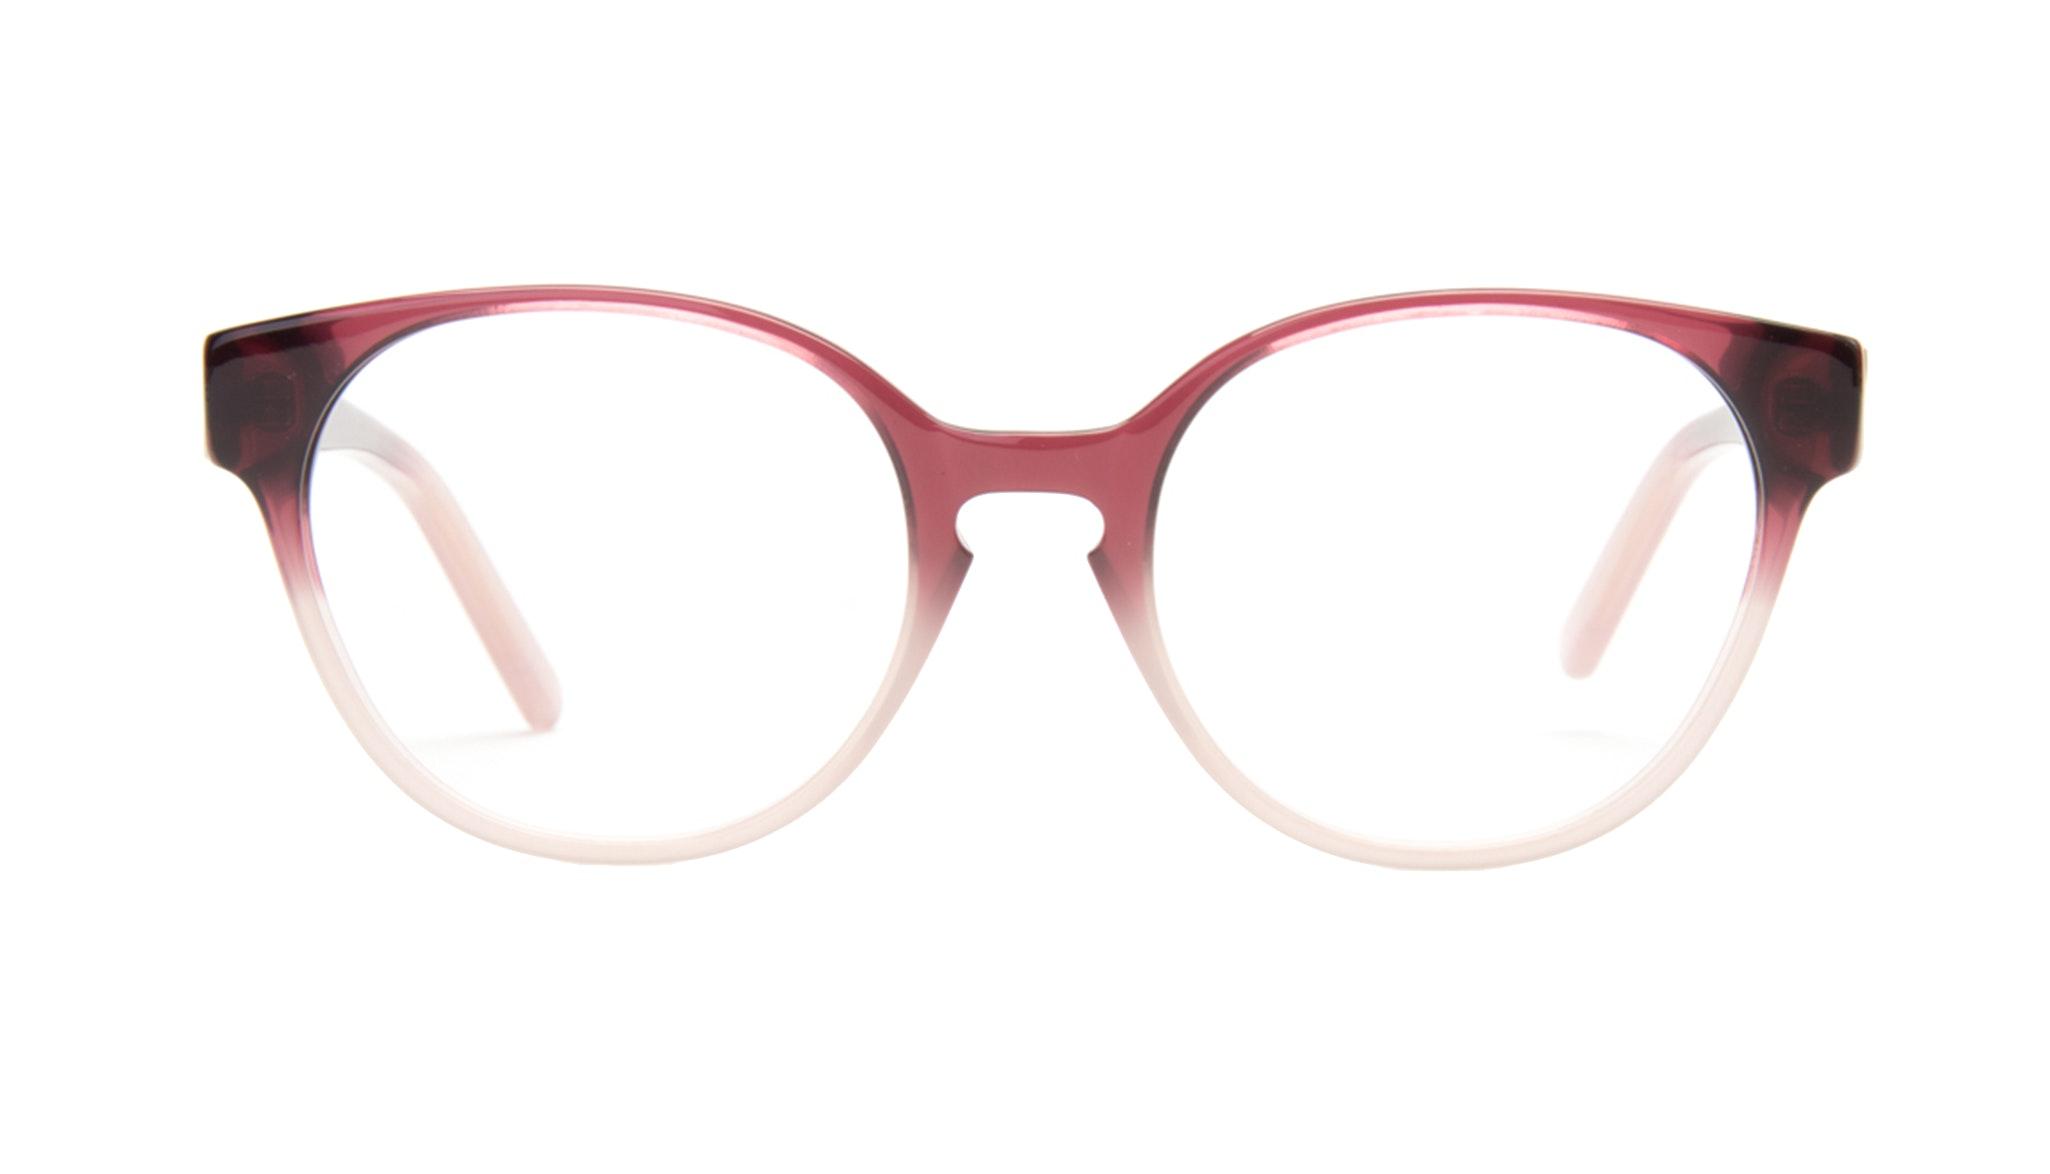 Lunettes tendance Ronde Optiques Femmes Winsome Berry